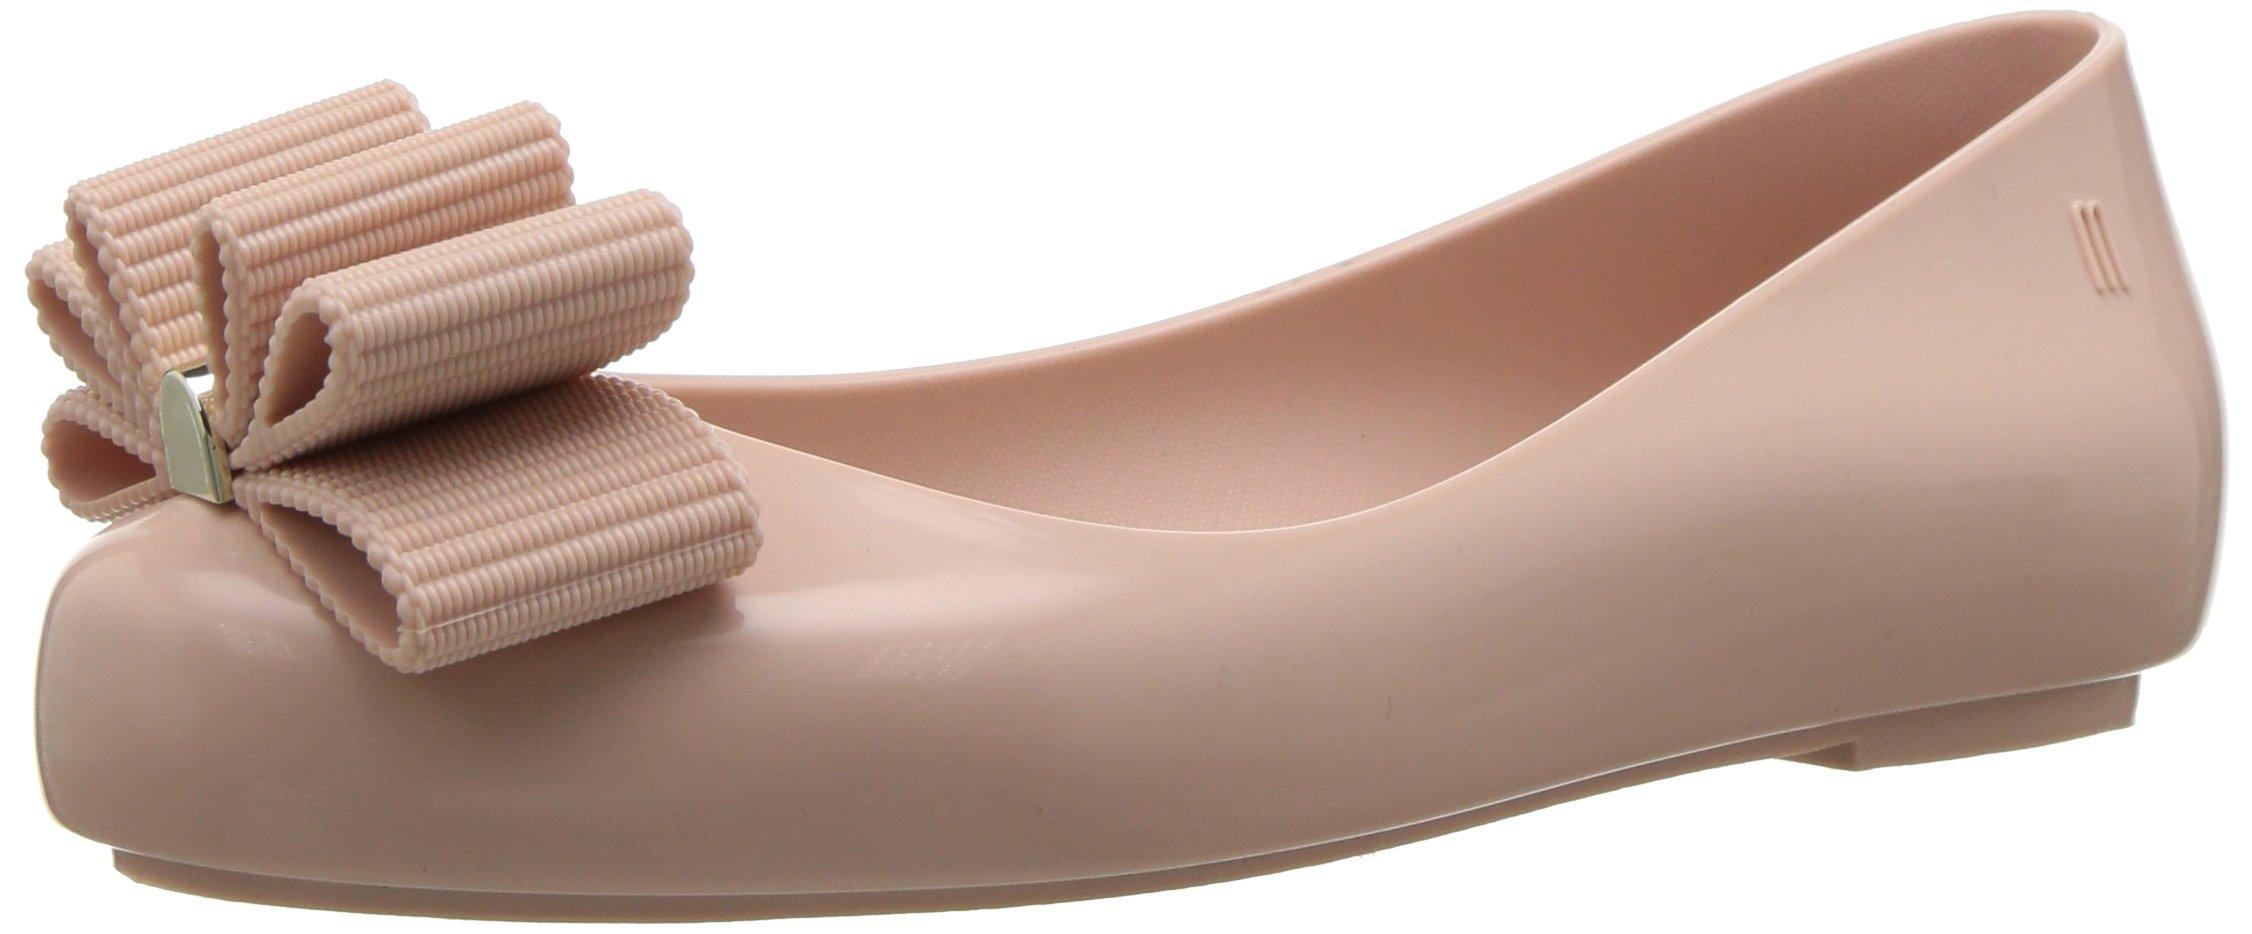 Mini Melissa Girls' Mel Space Love + Jason WU Ballet Flat, Sand, 1 M US Little Kid